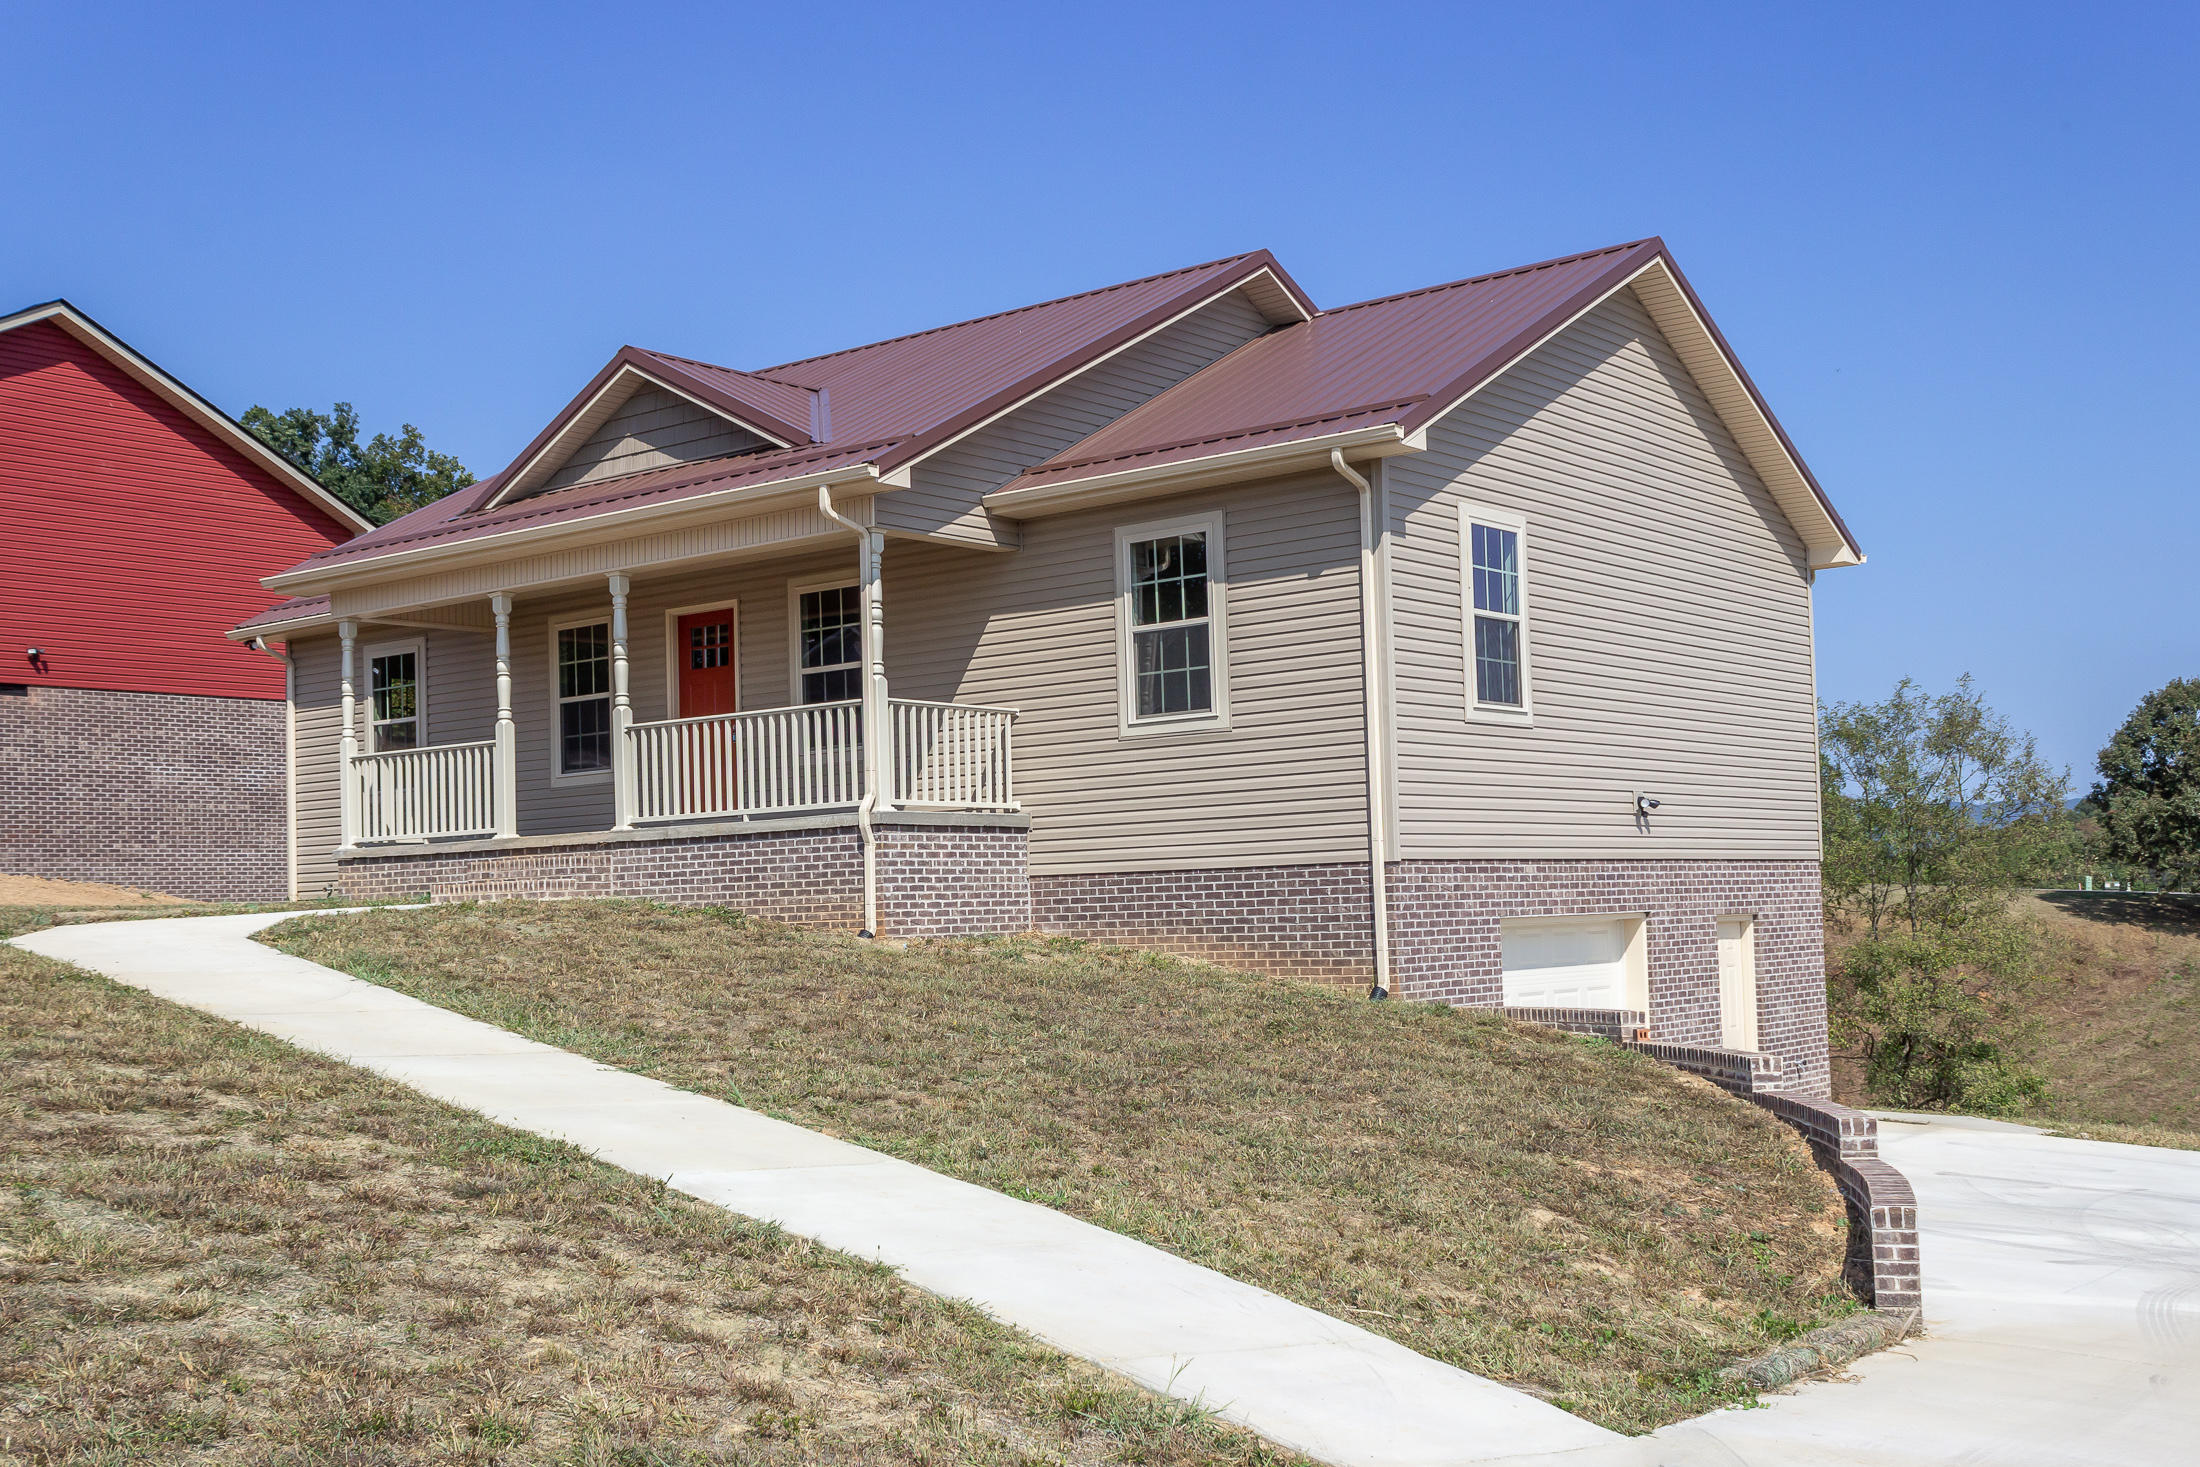 305 Pleasant Ridge Rd, Bean Station, Tennessee, United States 37708, 3 Bedrooms Bedrooms, ,2 BathroomsBathrooms,Single Family,For Sale,Pleasant Ridge Rd,1111424